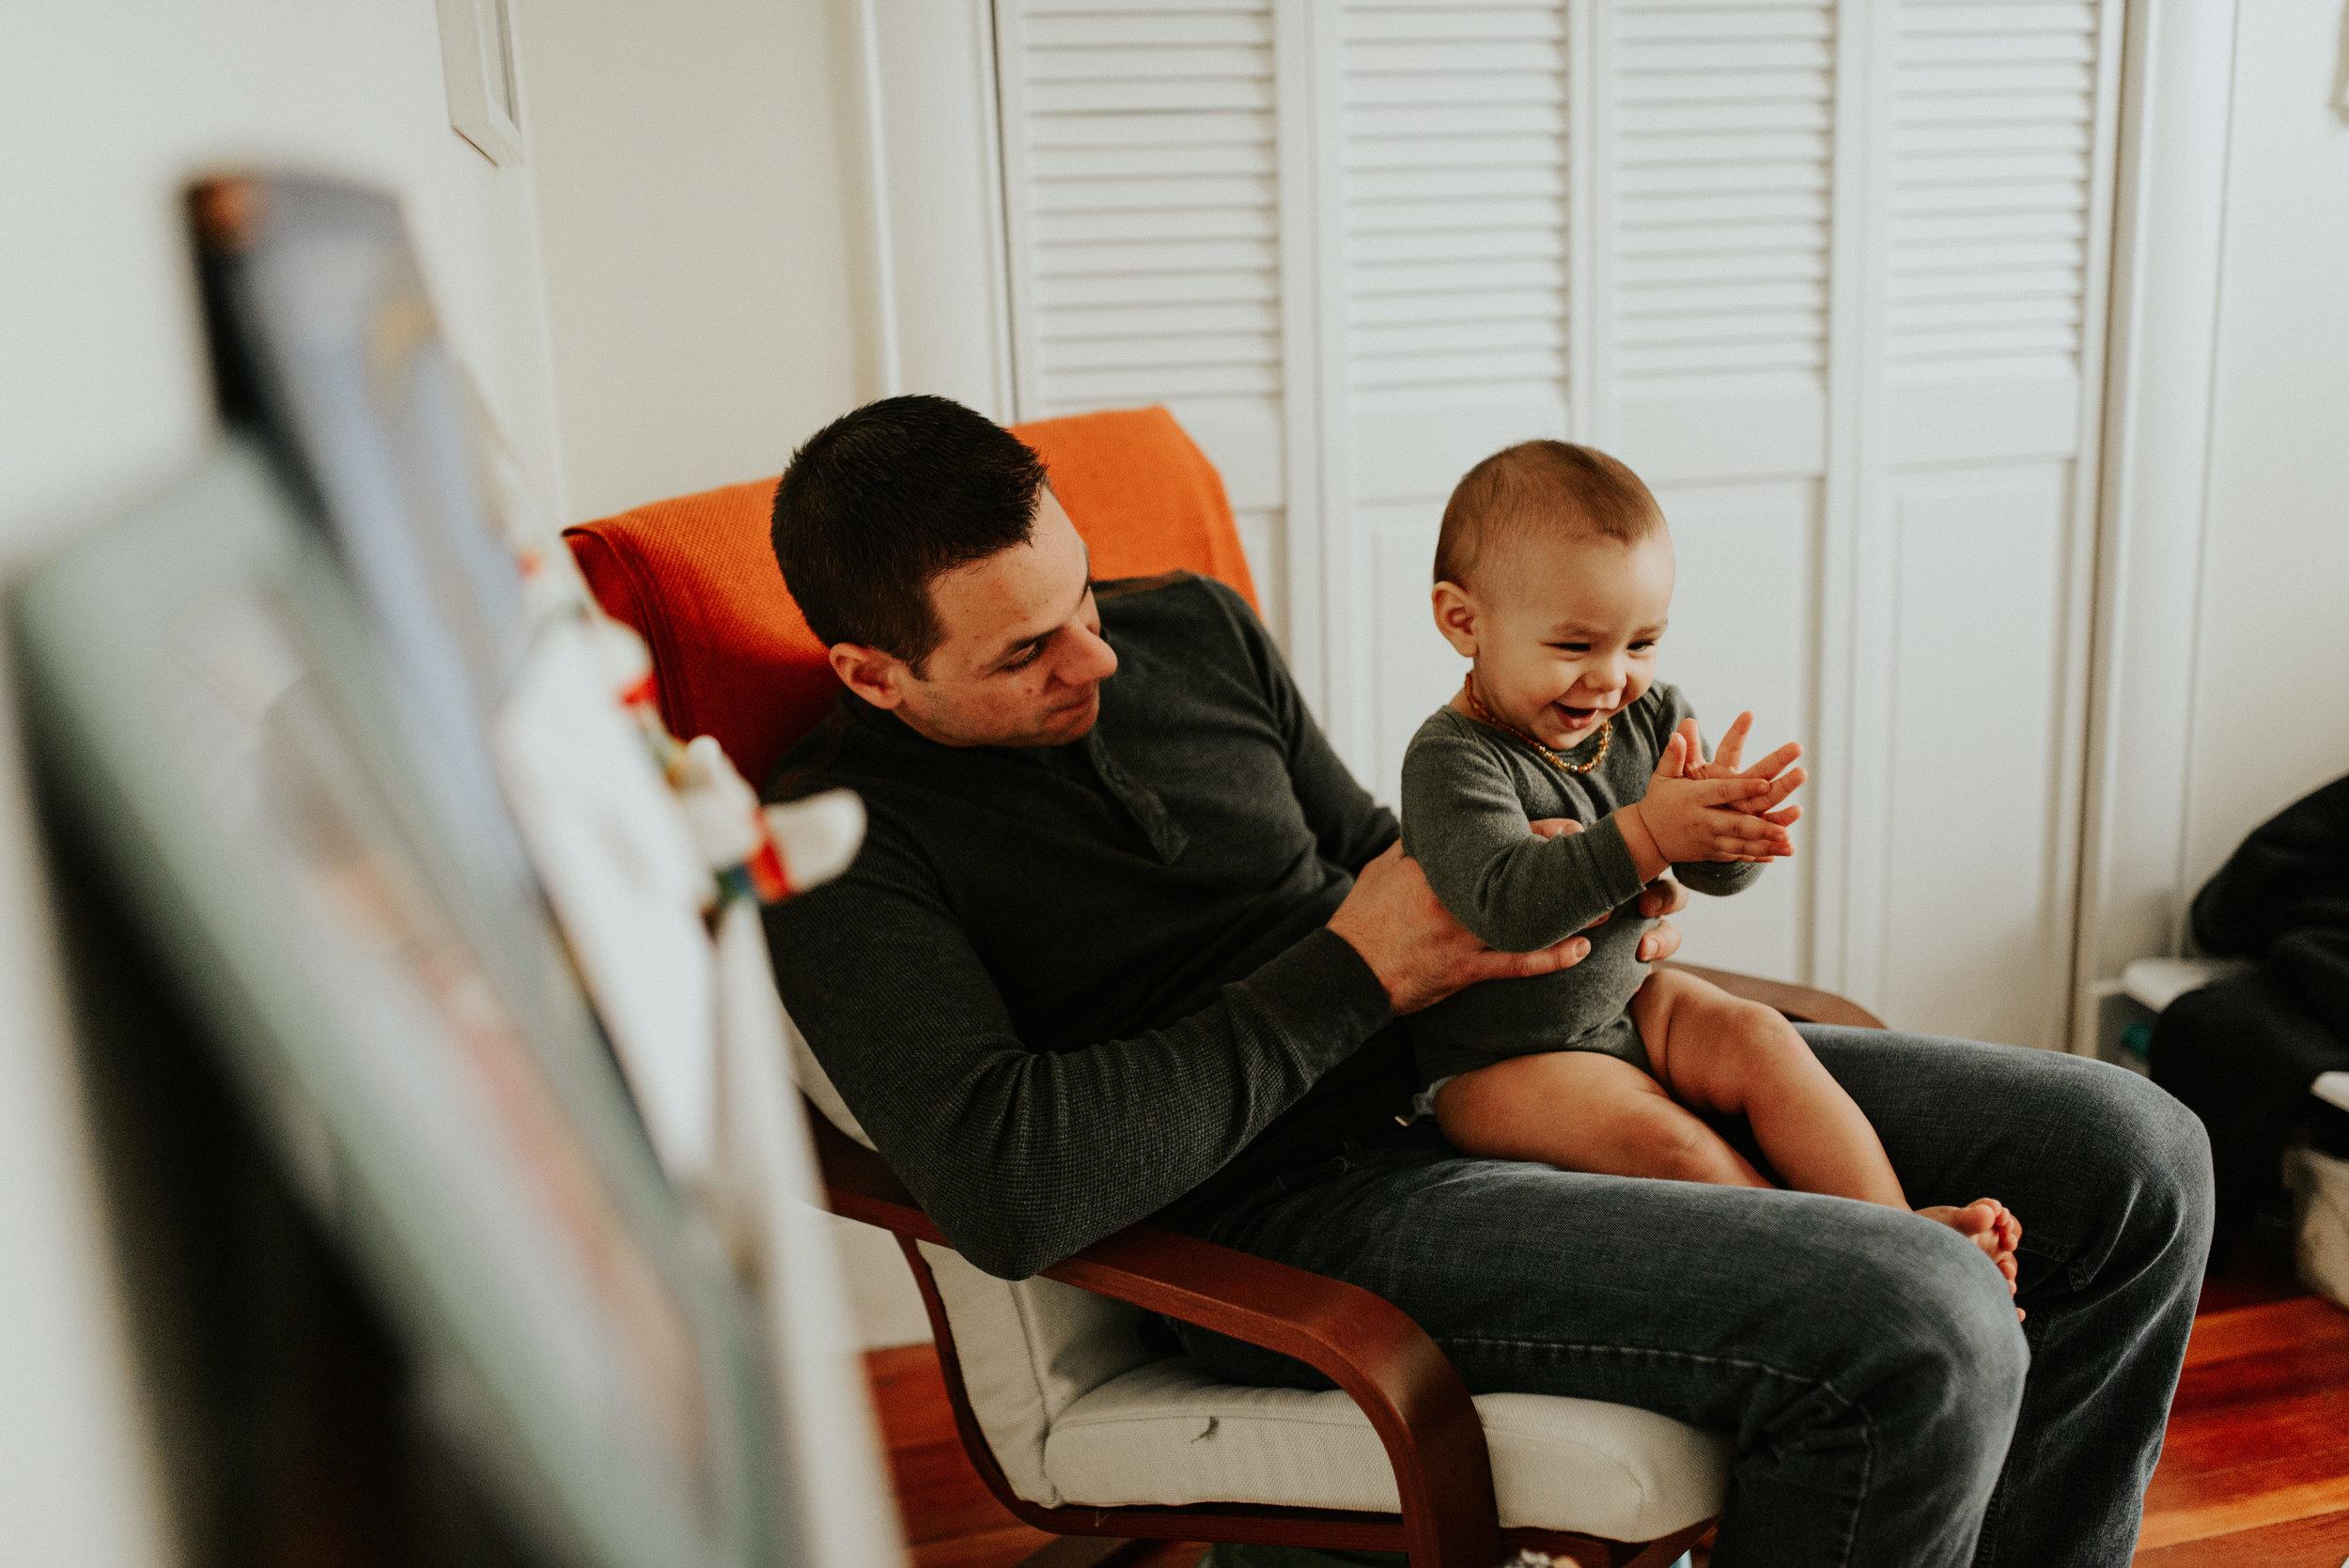 Hilchey-Massachusetts-In Home Lifestyle-Winter Family Session-Photographer-00159.jpg